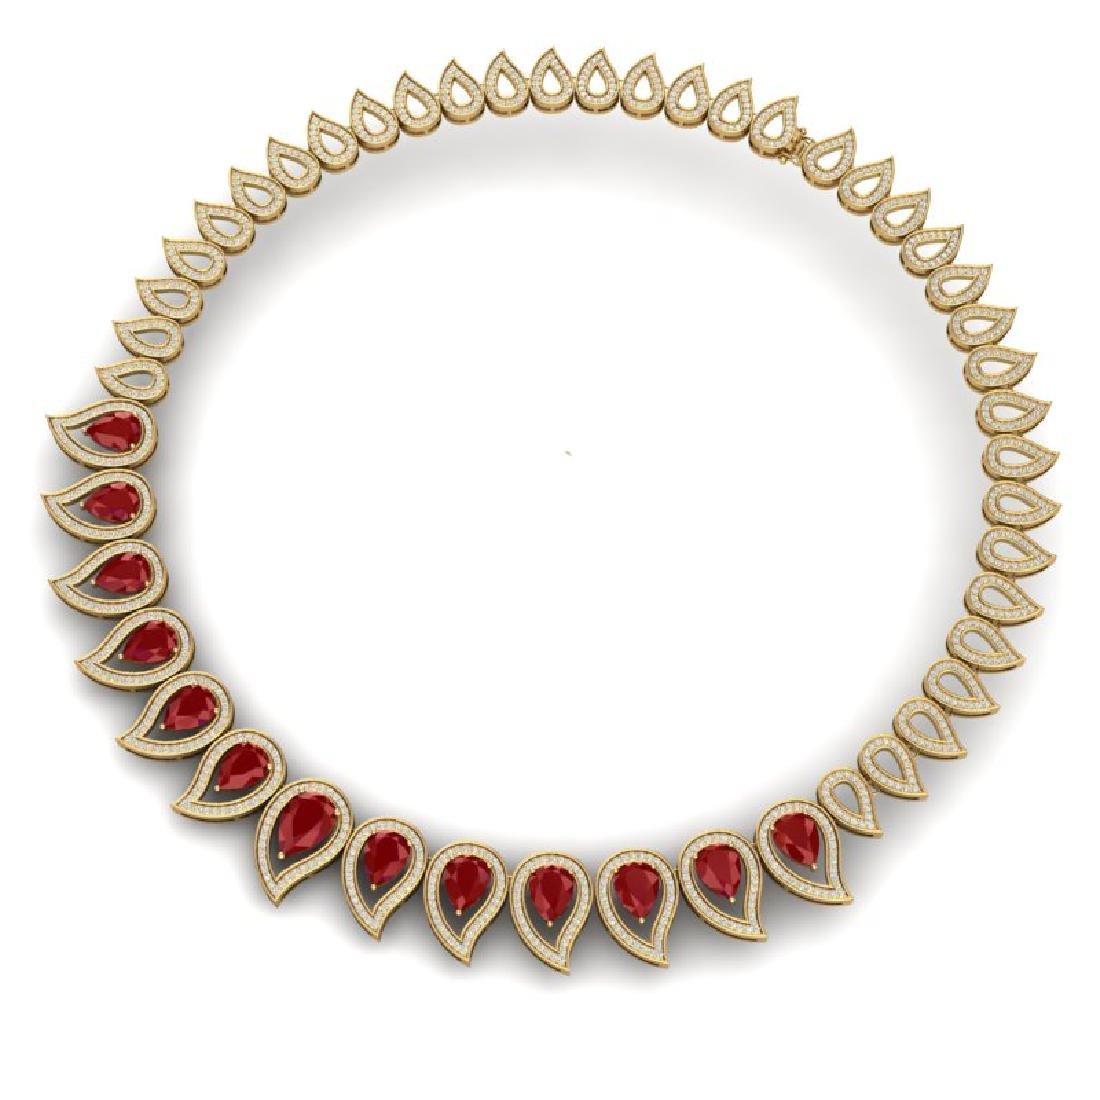 33.4 CTW Royalty Designer Ruby & VS Diamond Necklace - 3